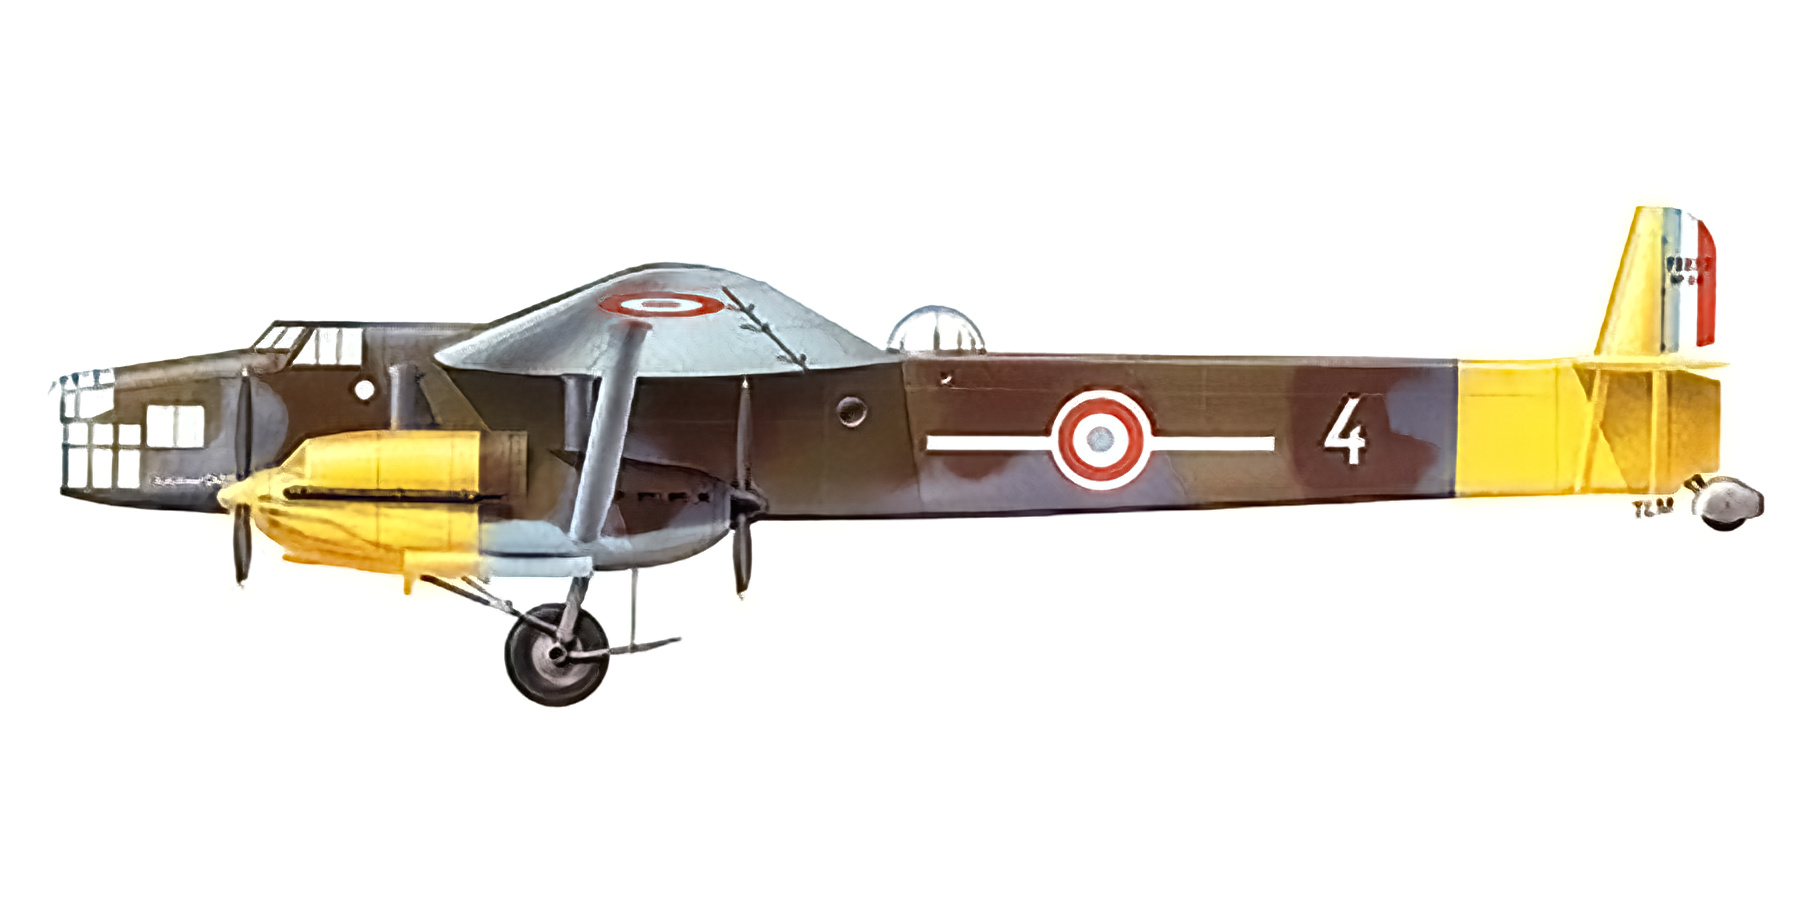 French Airforce Farman NC223 White 4 France 1940 profile 0A